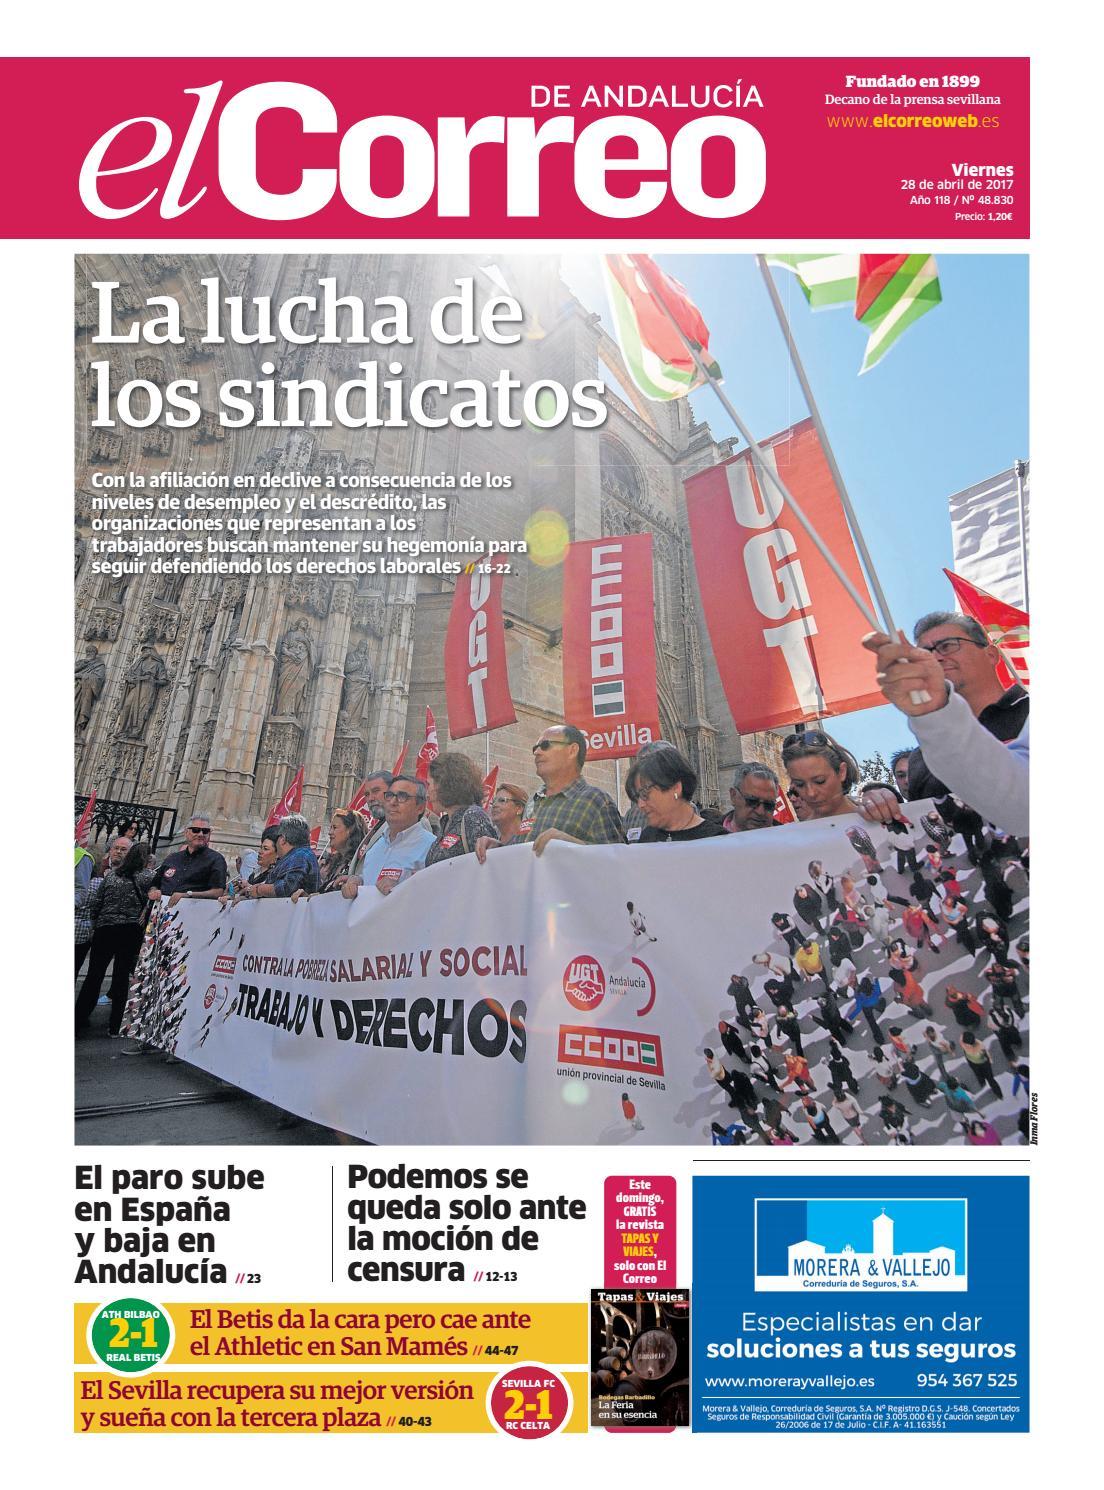 De S Andalucía 04 28 Correo By El lIssuu 2017 0Pyv8OmnNw